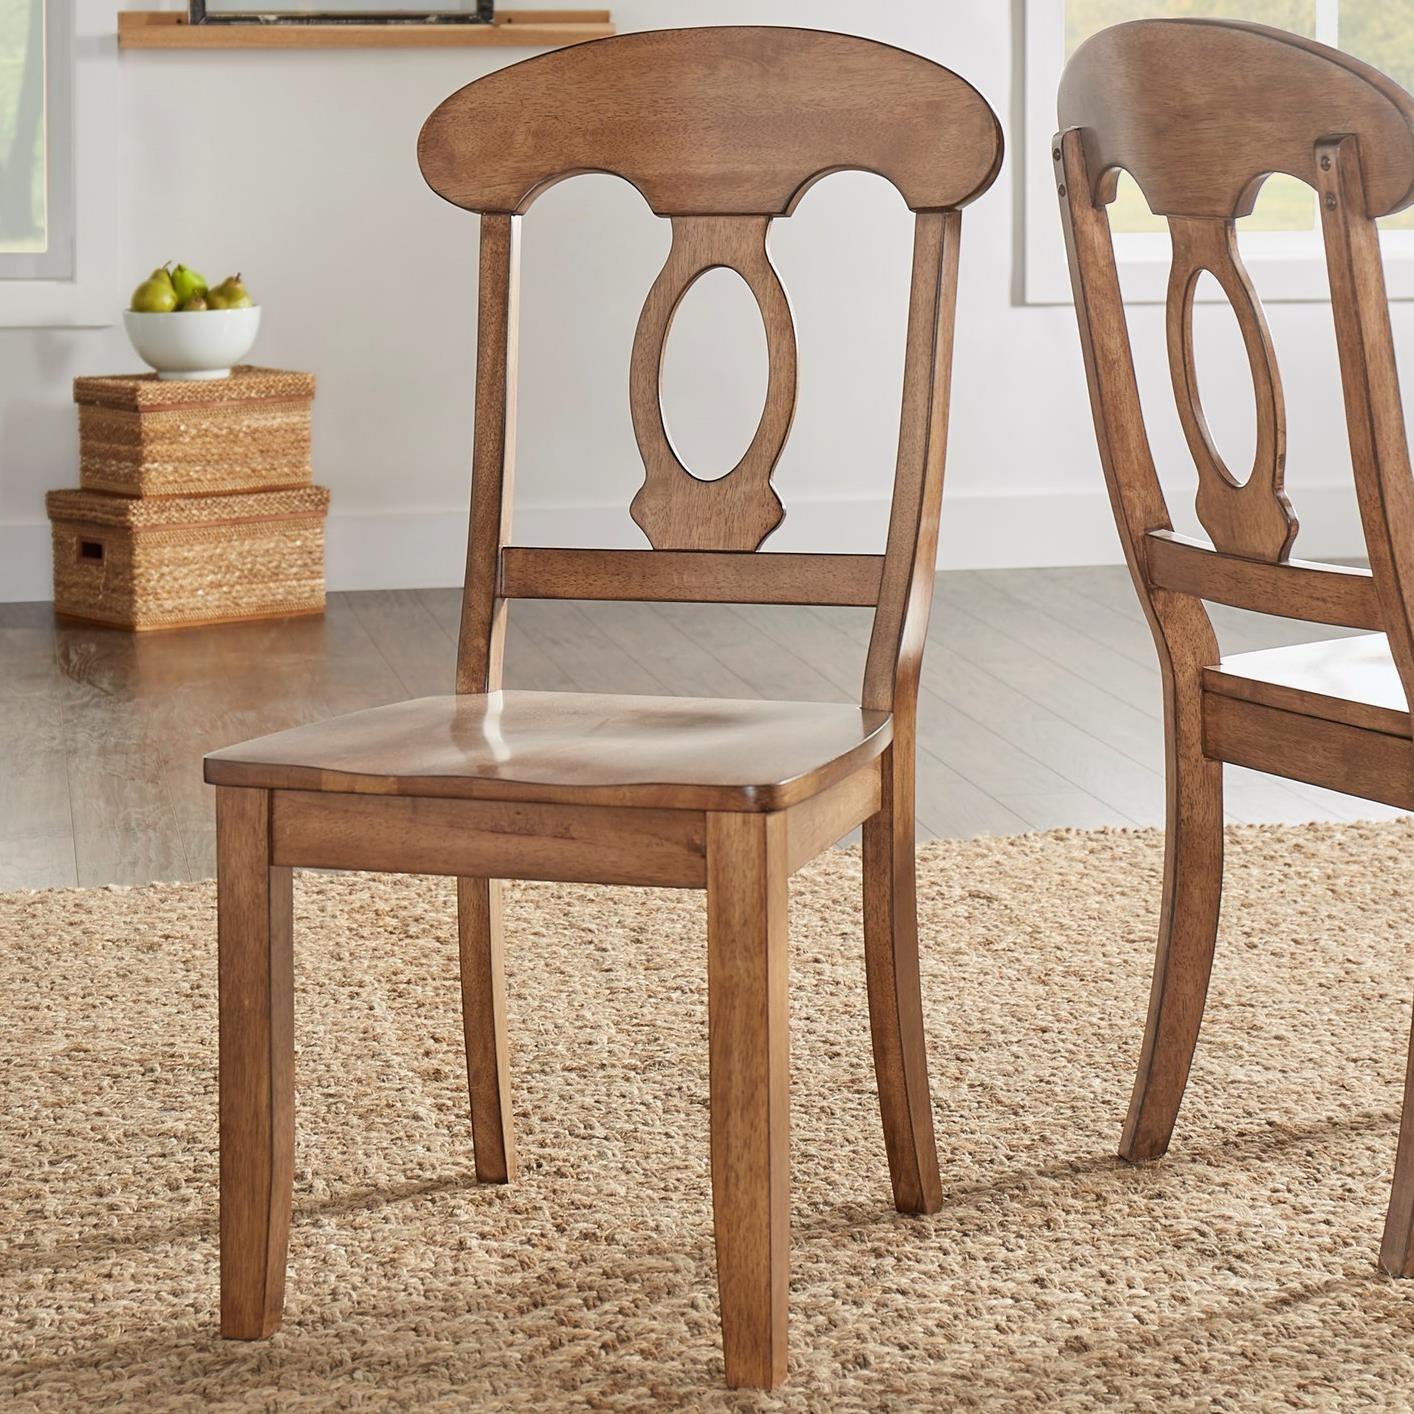 Homelegance 530 Dining Side Chair - Item Number: 530C4-AK